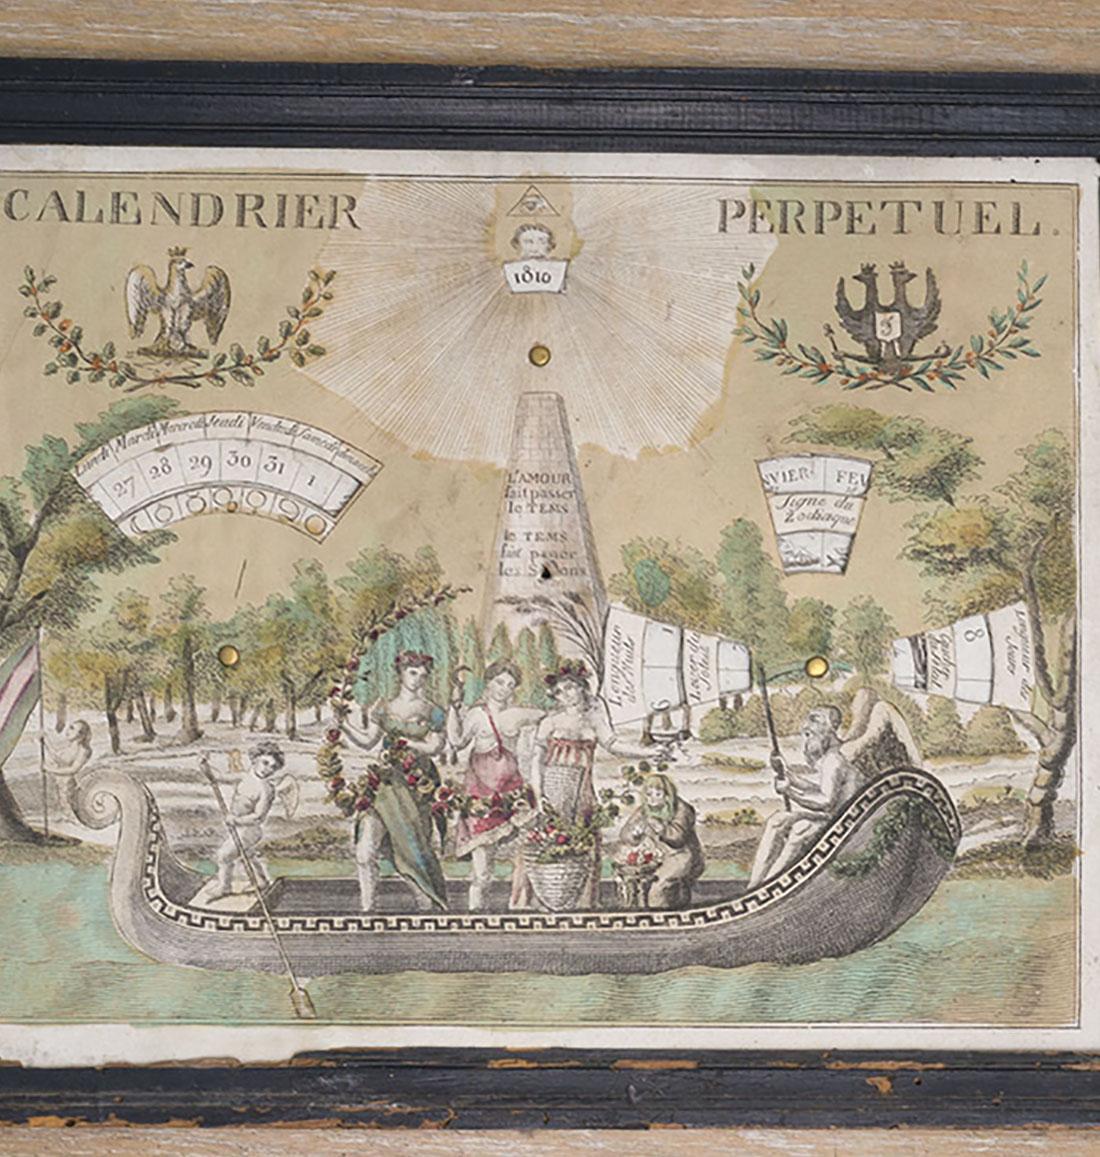 Perpetual calendar 1810 - 1820s.